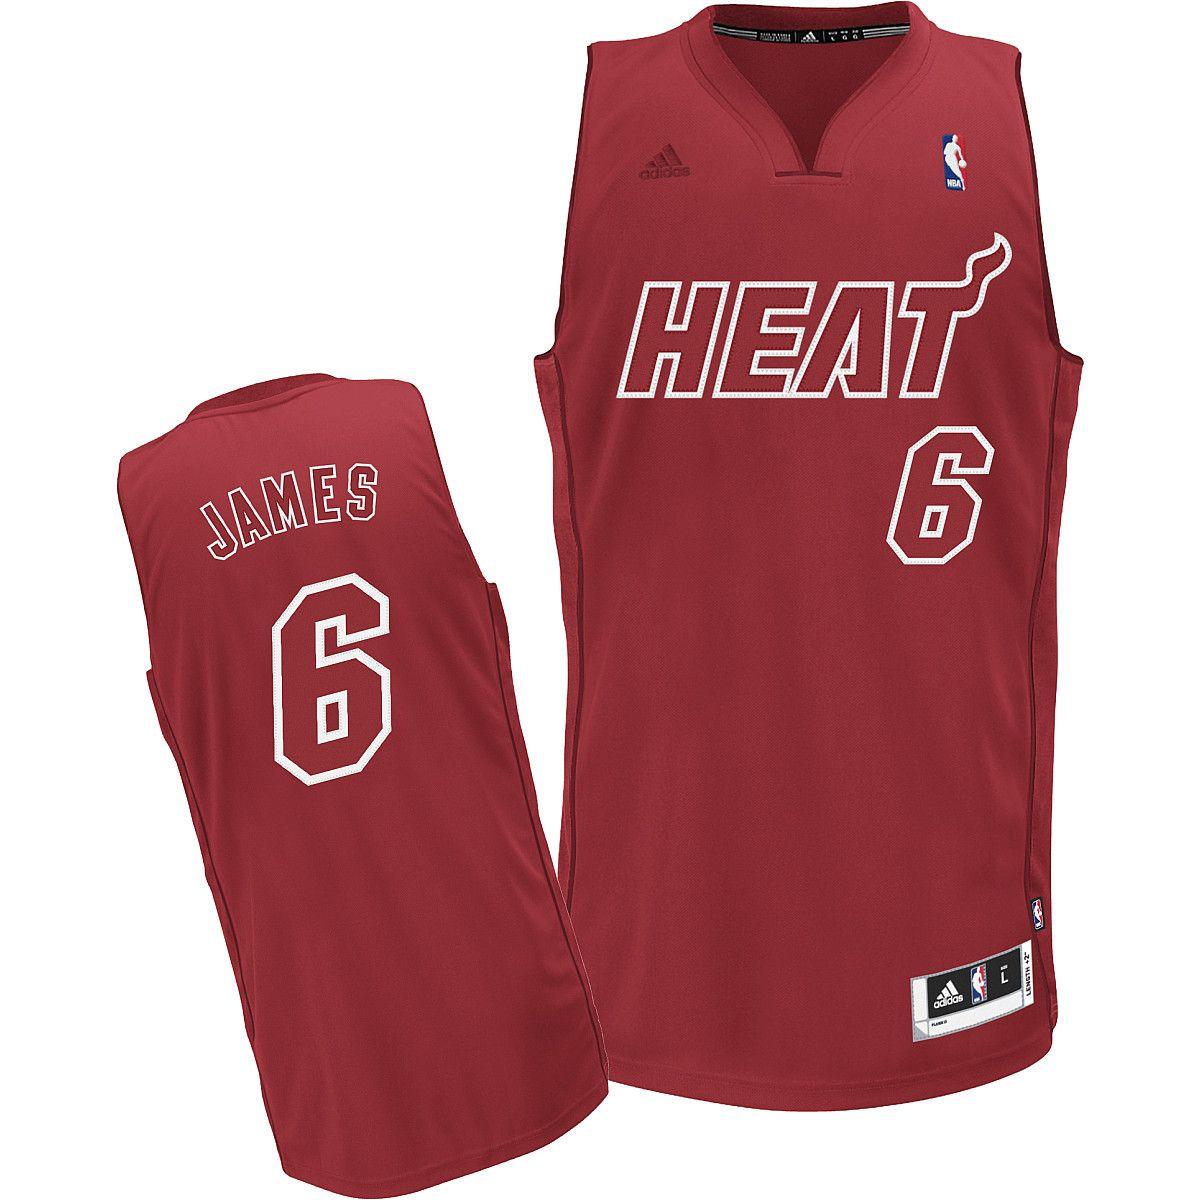 promo code 923e0 d5755 heat christmas jersey